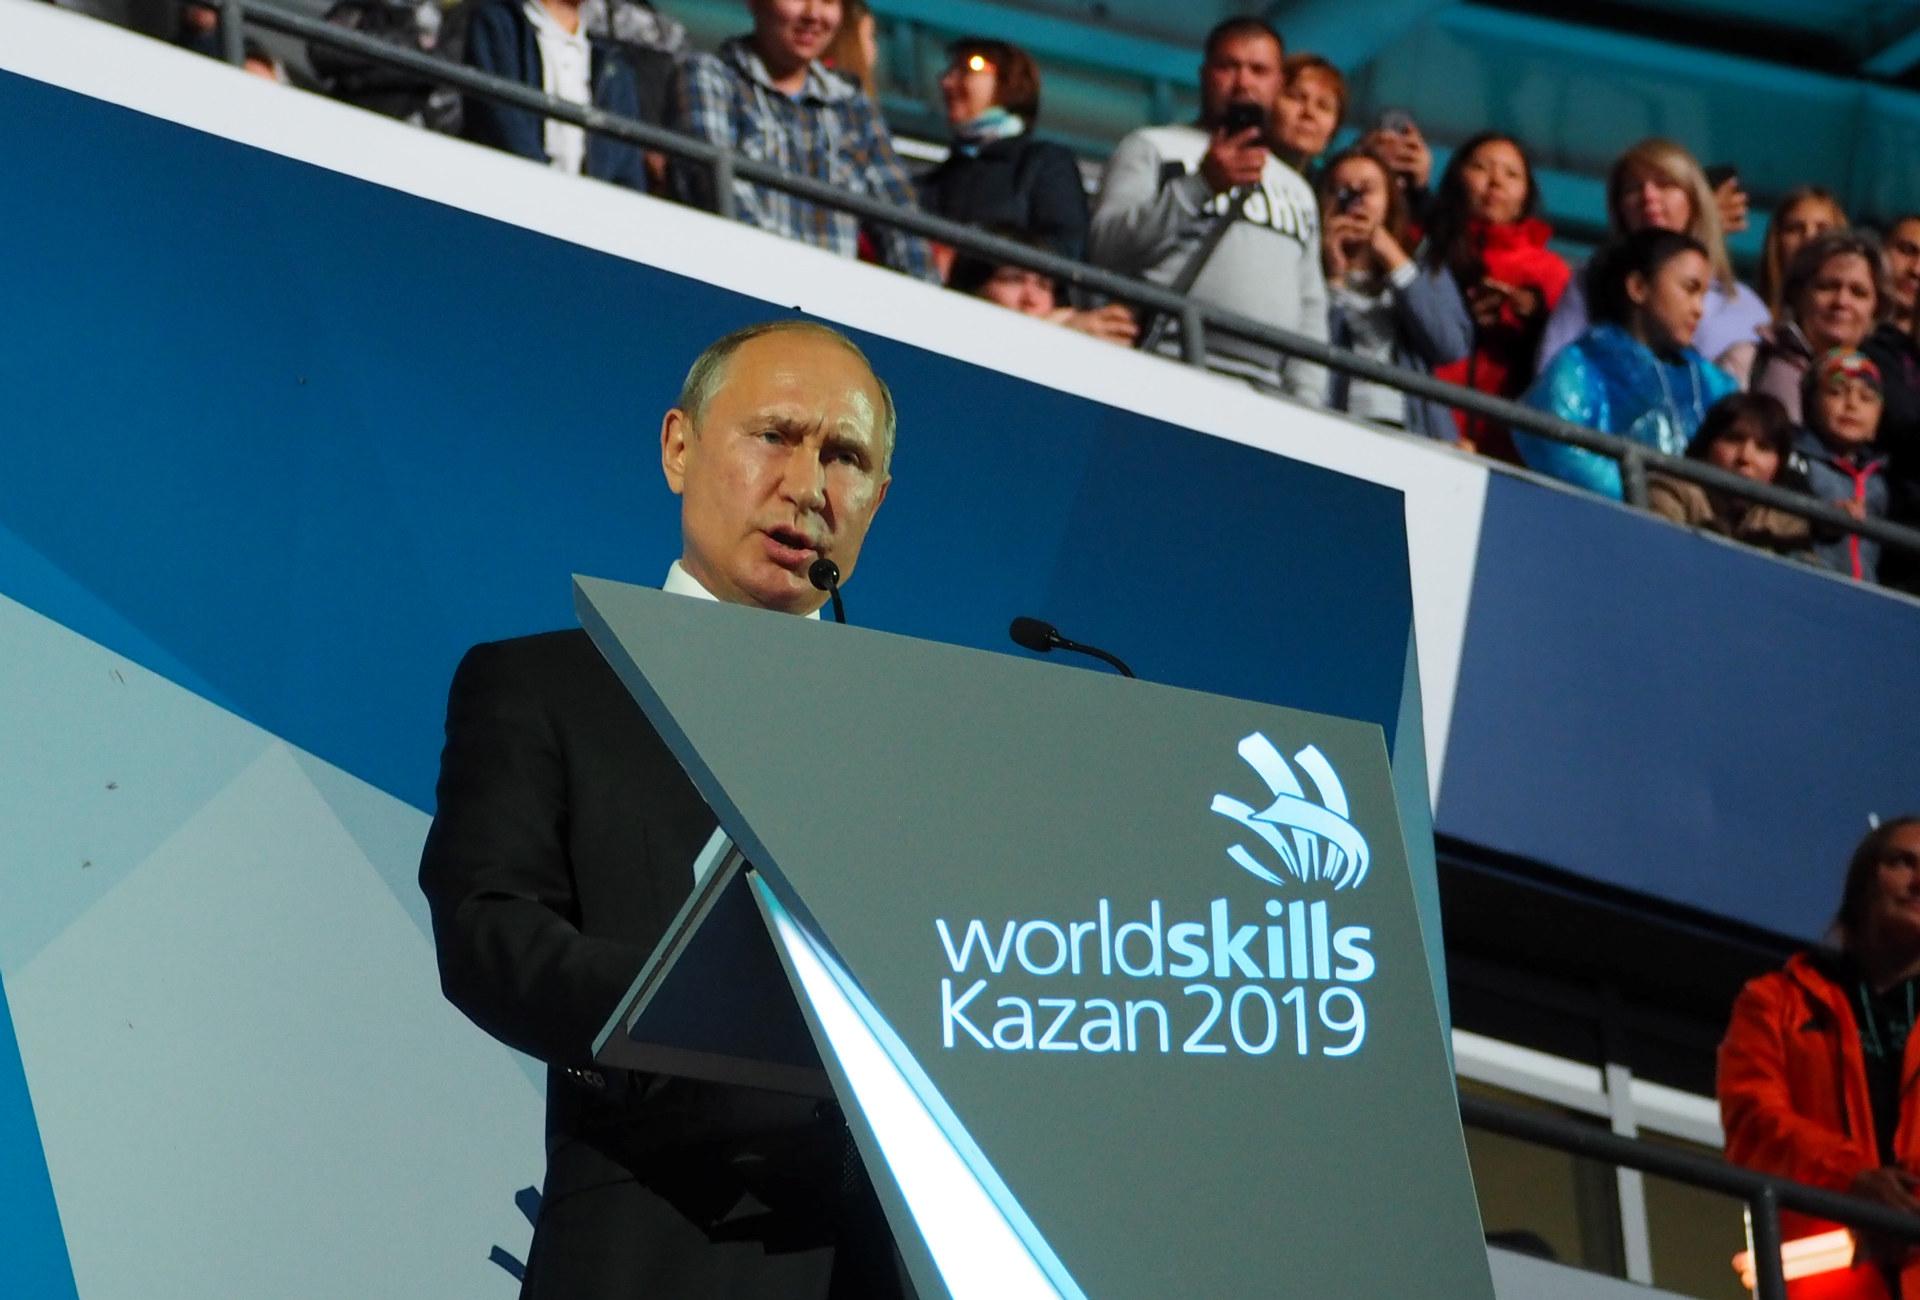 President Vladimir Putin avsluttet årets Yrkes-VM i Russland. Foto: Cathrine W. Eidal / WorldSkills Norway